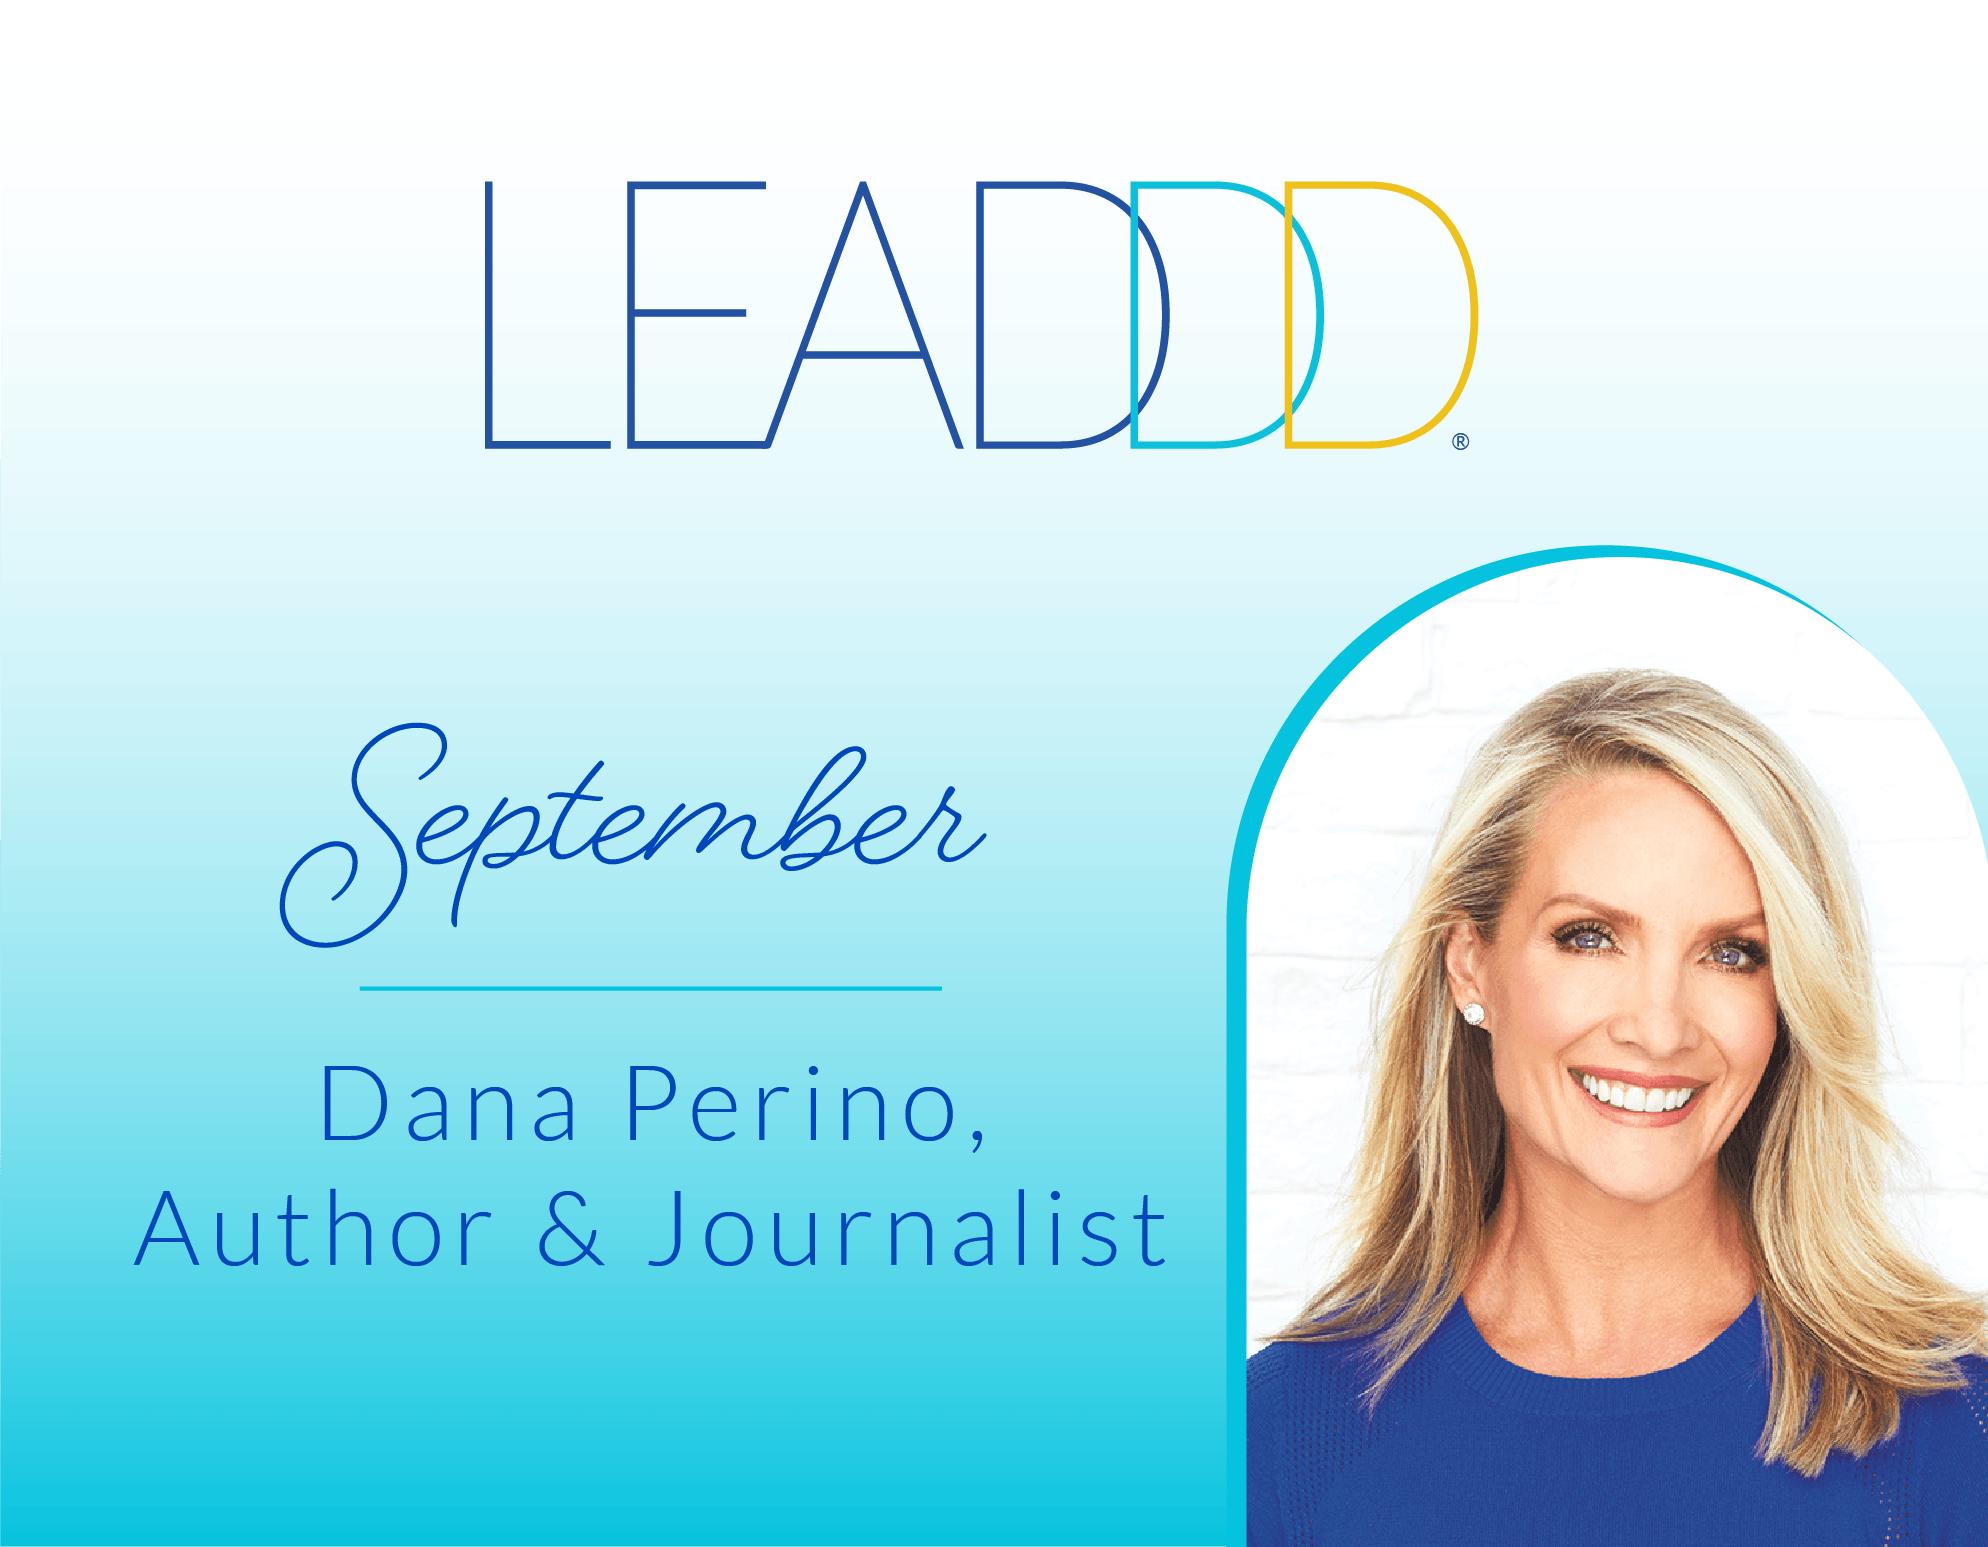 LEADDD Keynote Series: September